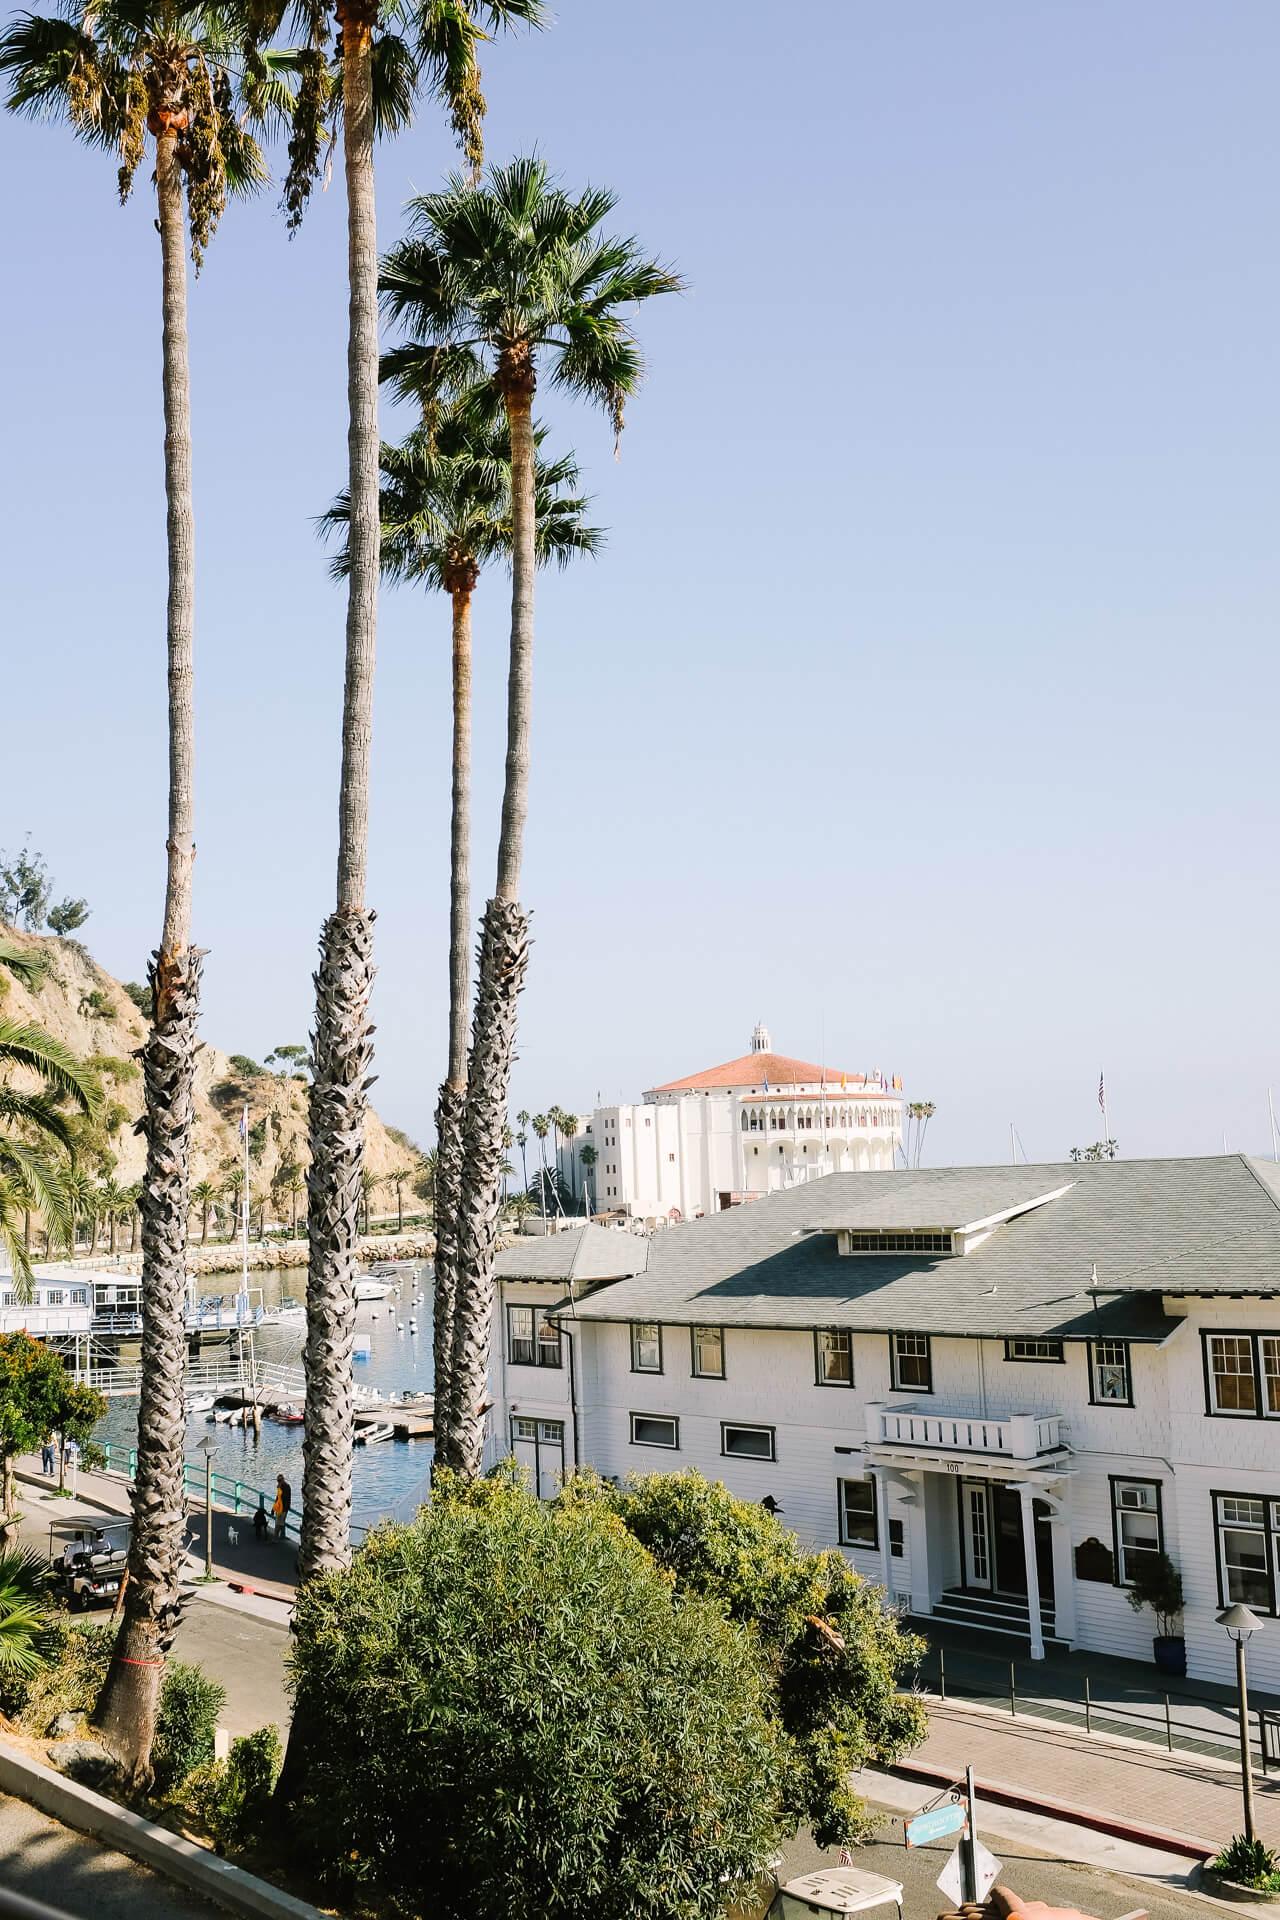 a beautiful day on Catalina Island